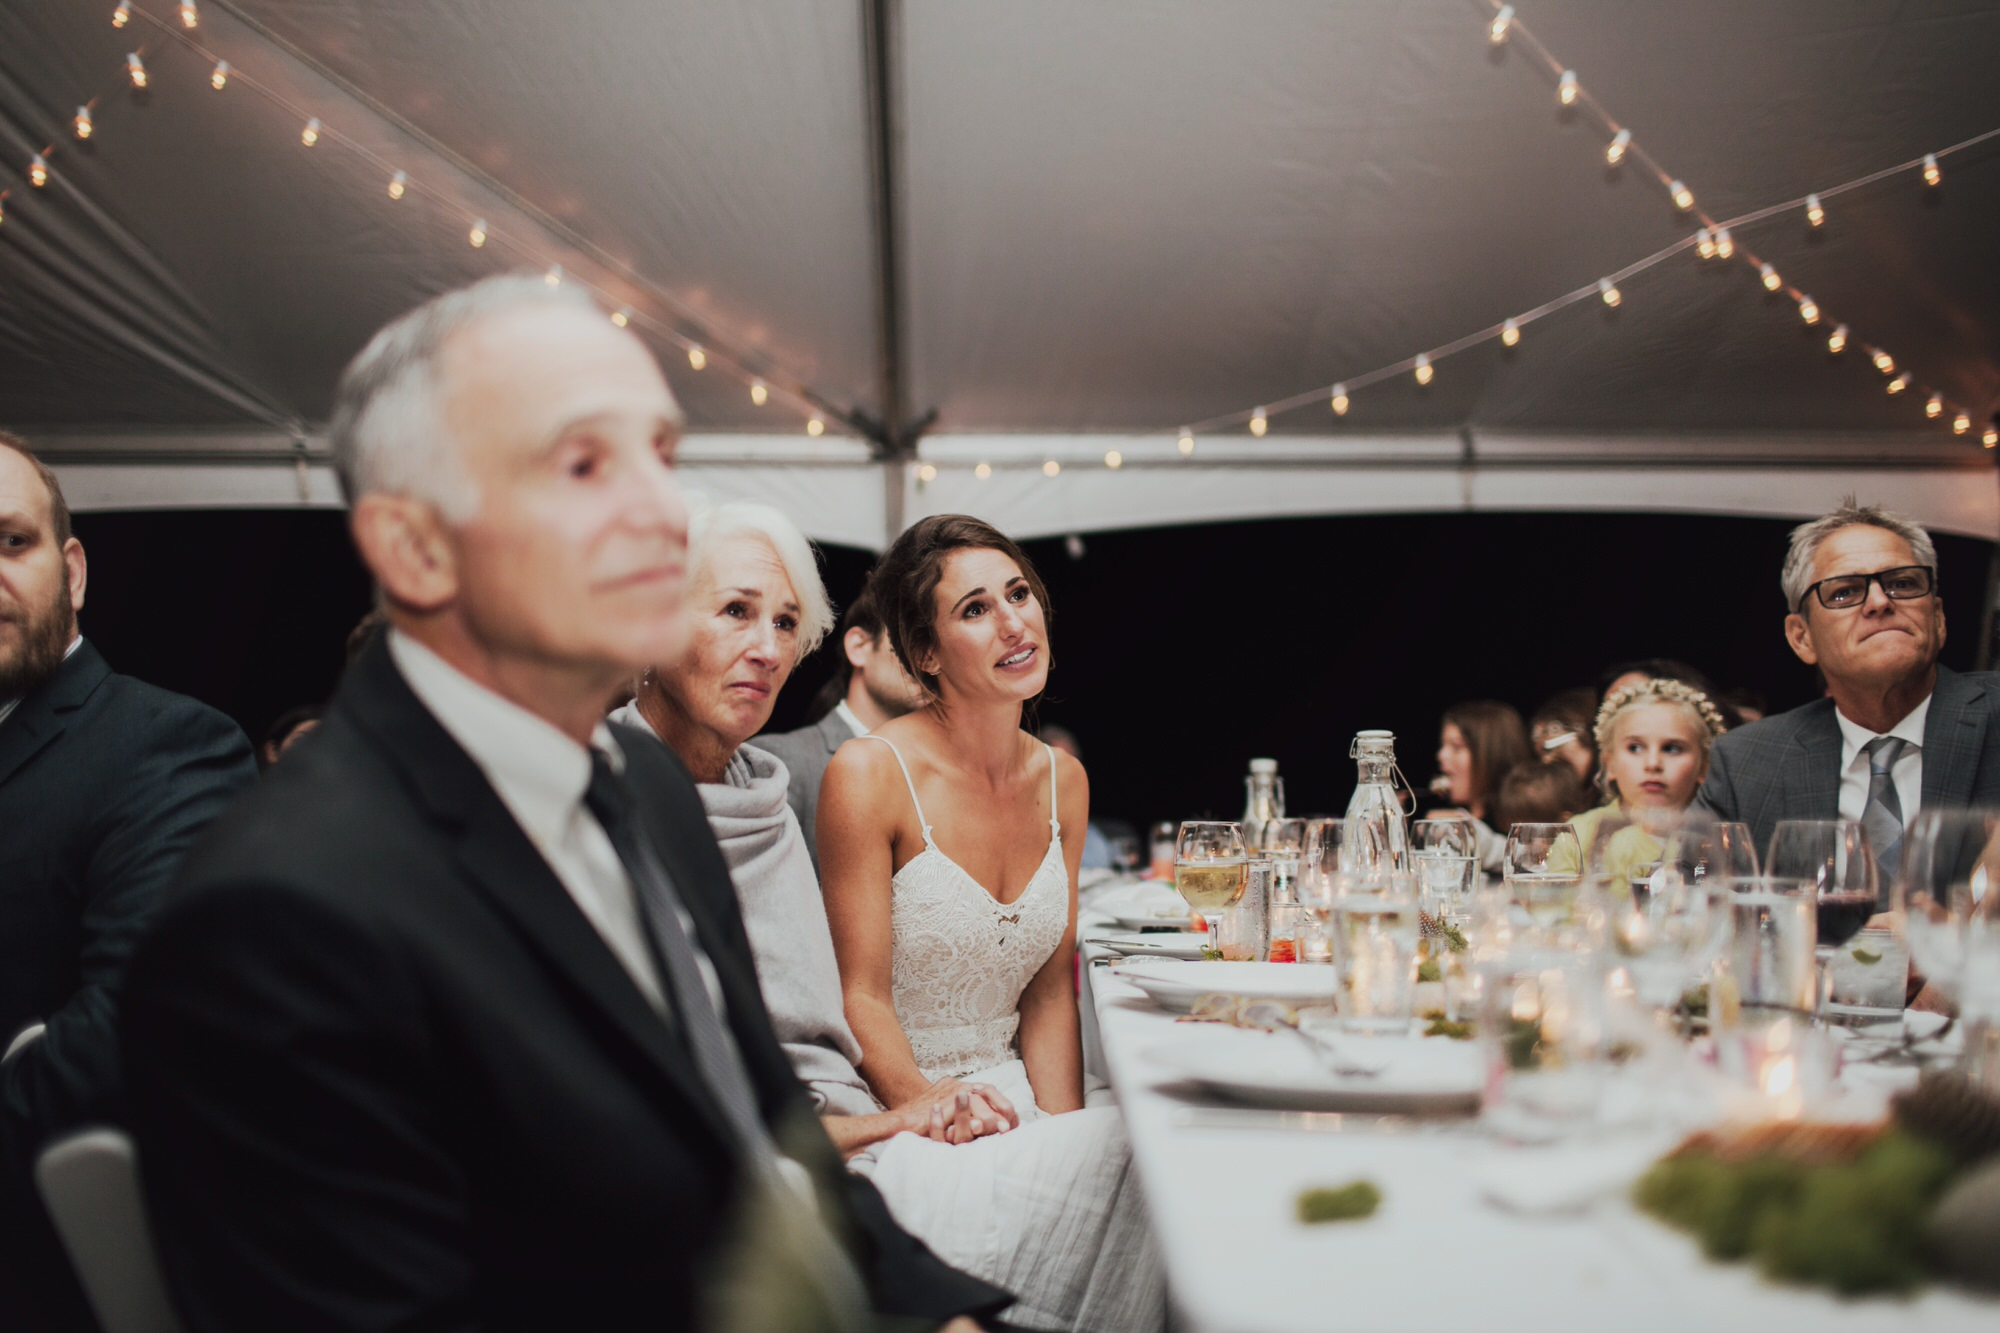 emily-aaron-rochester-new-york-wedding-photographer-115.JPG